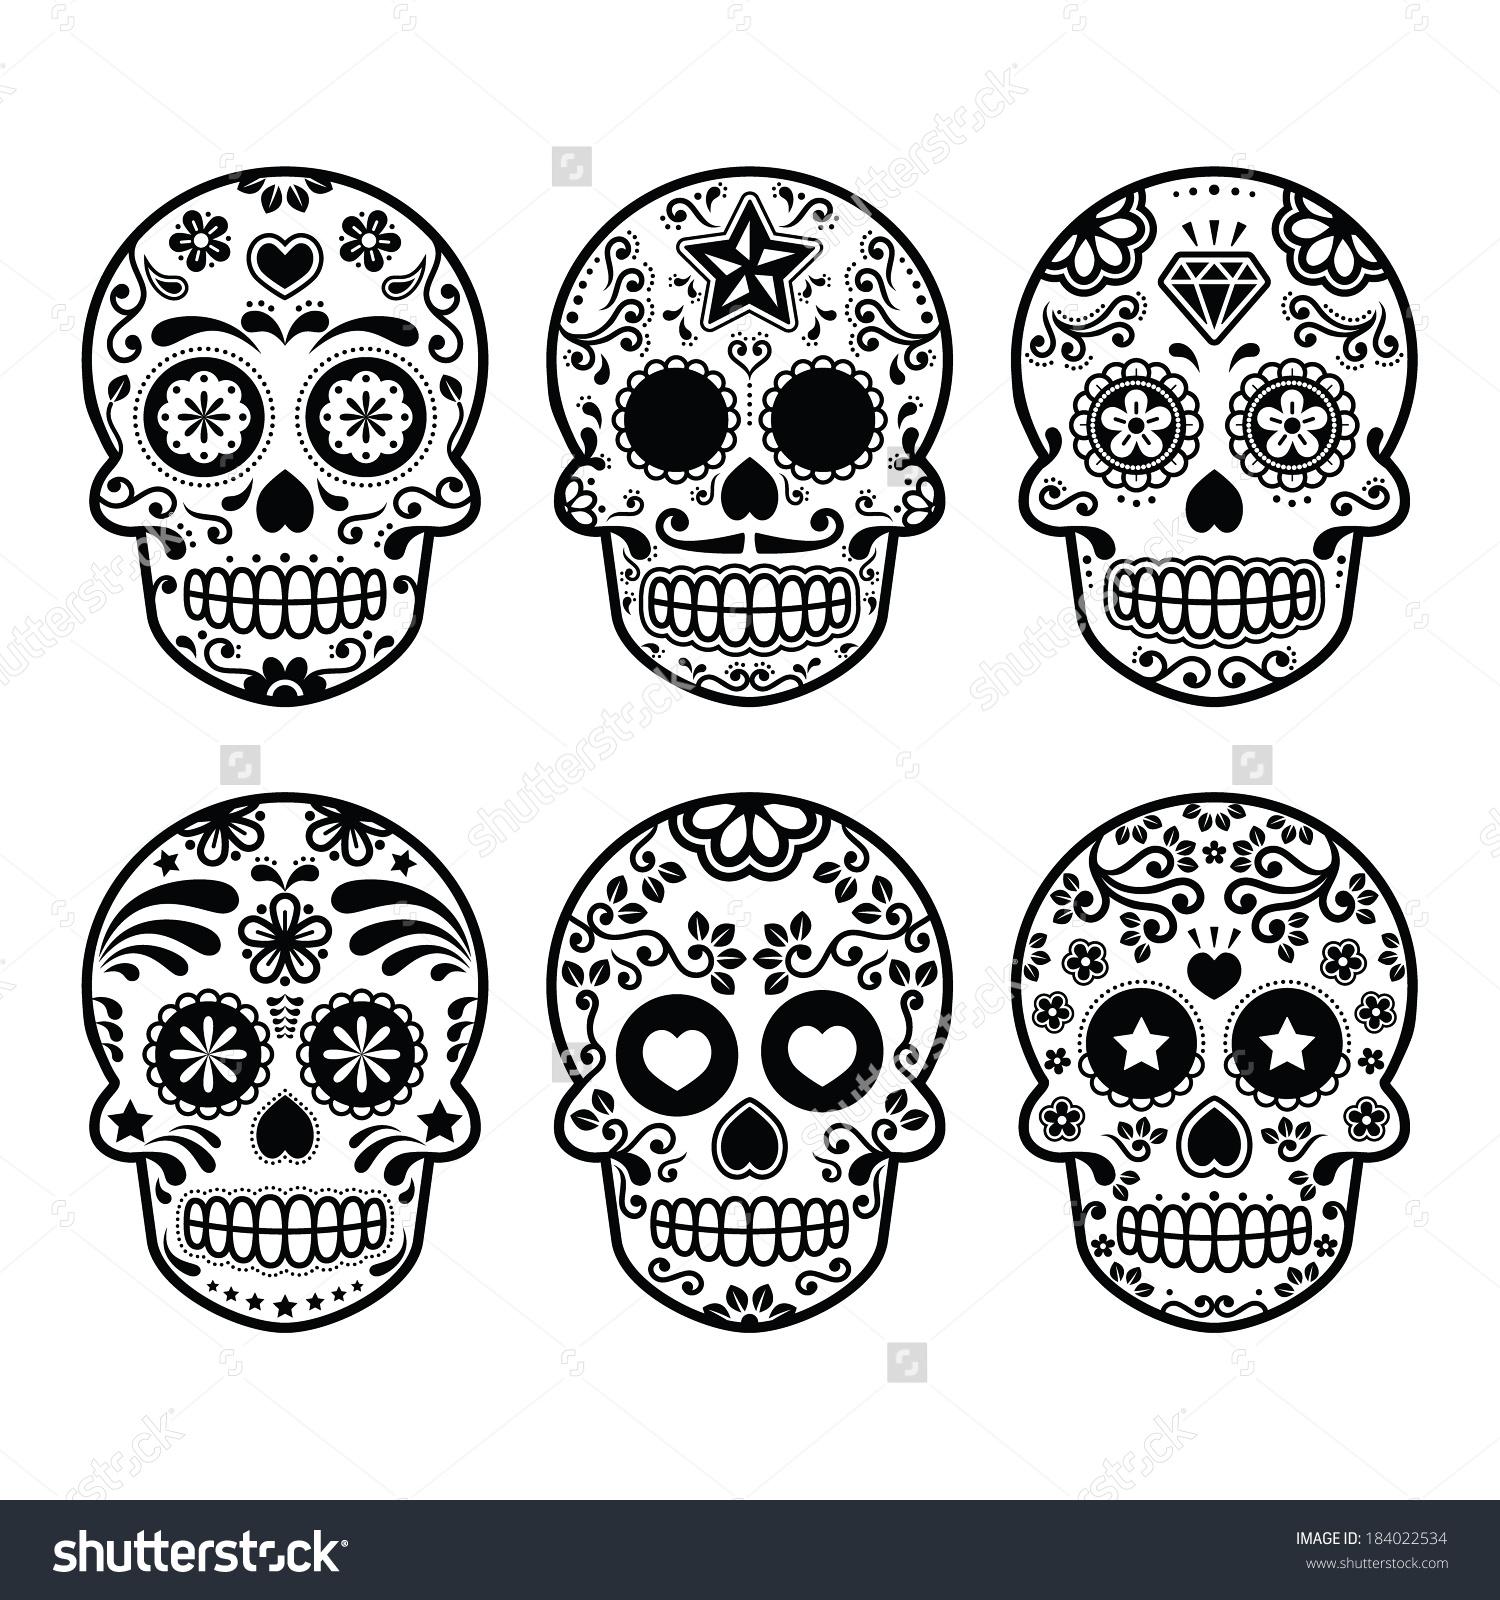 Sugar Skull Backgrounds on Wallpapers Vista